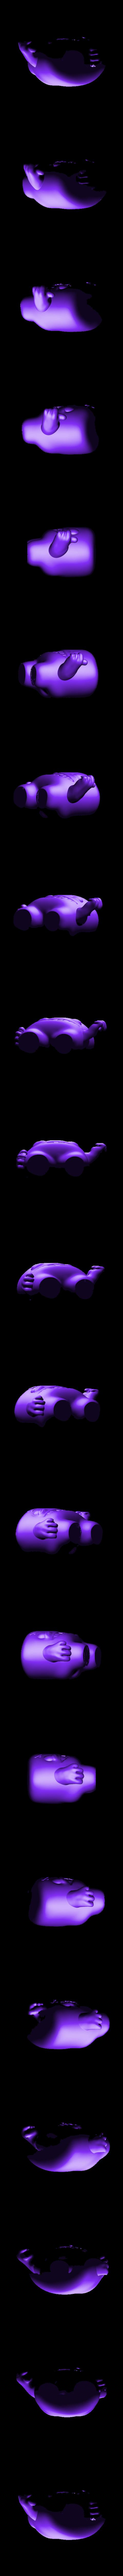 supermeatboy.stl Download free STL file Super Meat Boy! • 3D printable template, ChaosCoreTech